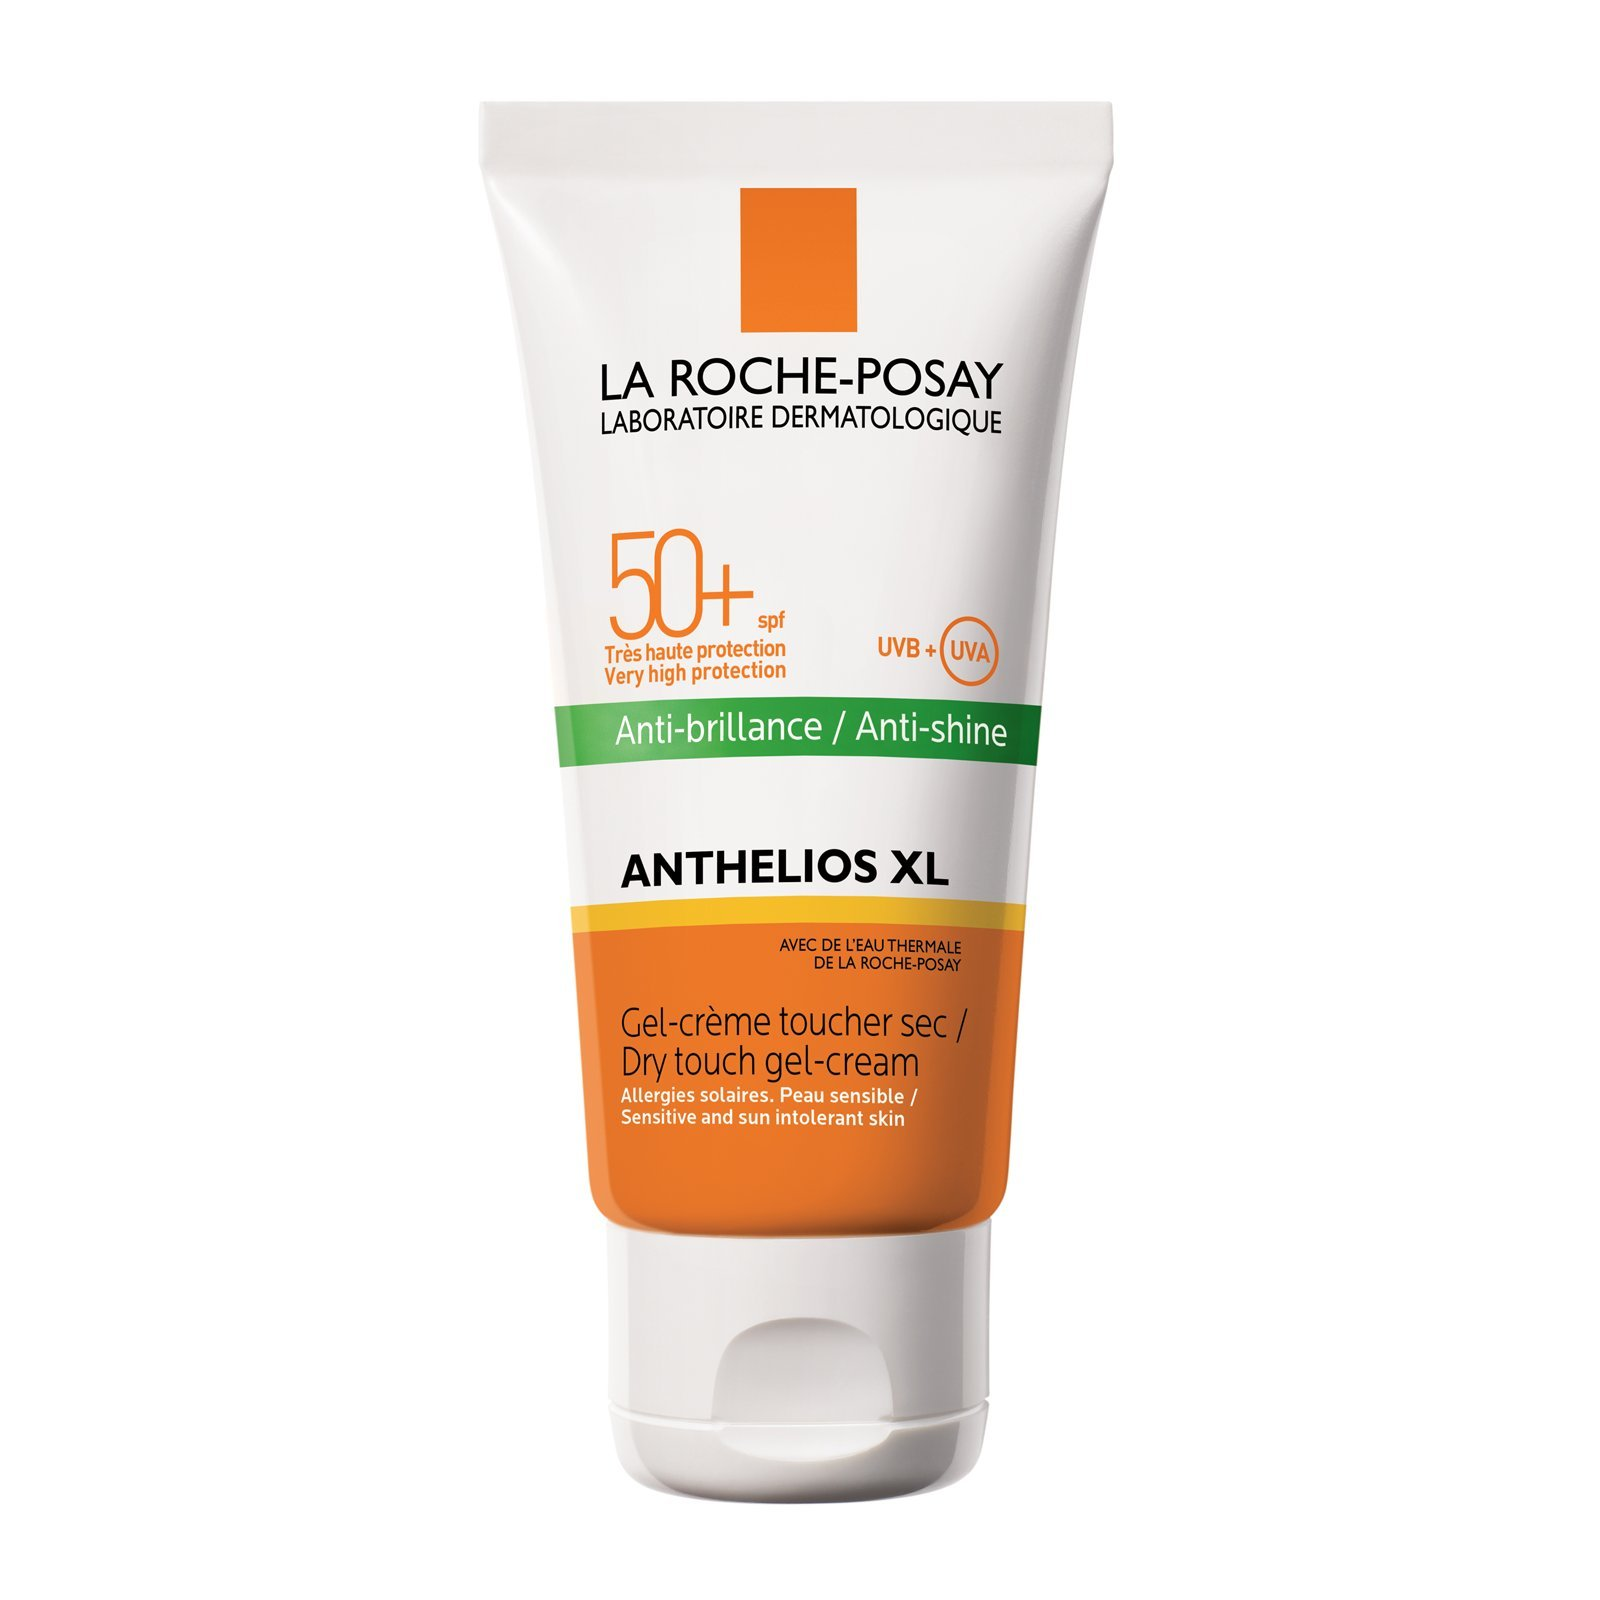 La Roche-Posay Anthelios XL SPF 50 Dry Touch Gel-cream by La Roche-Posay